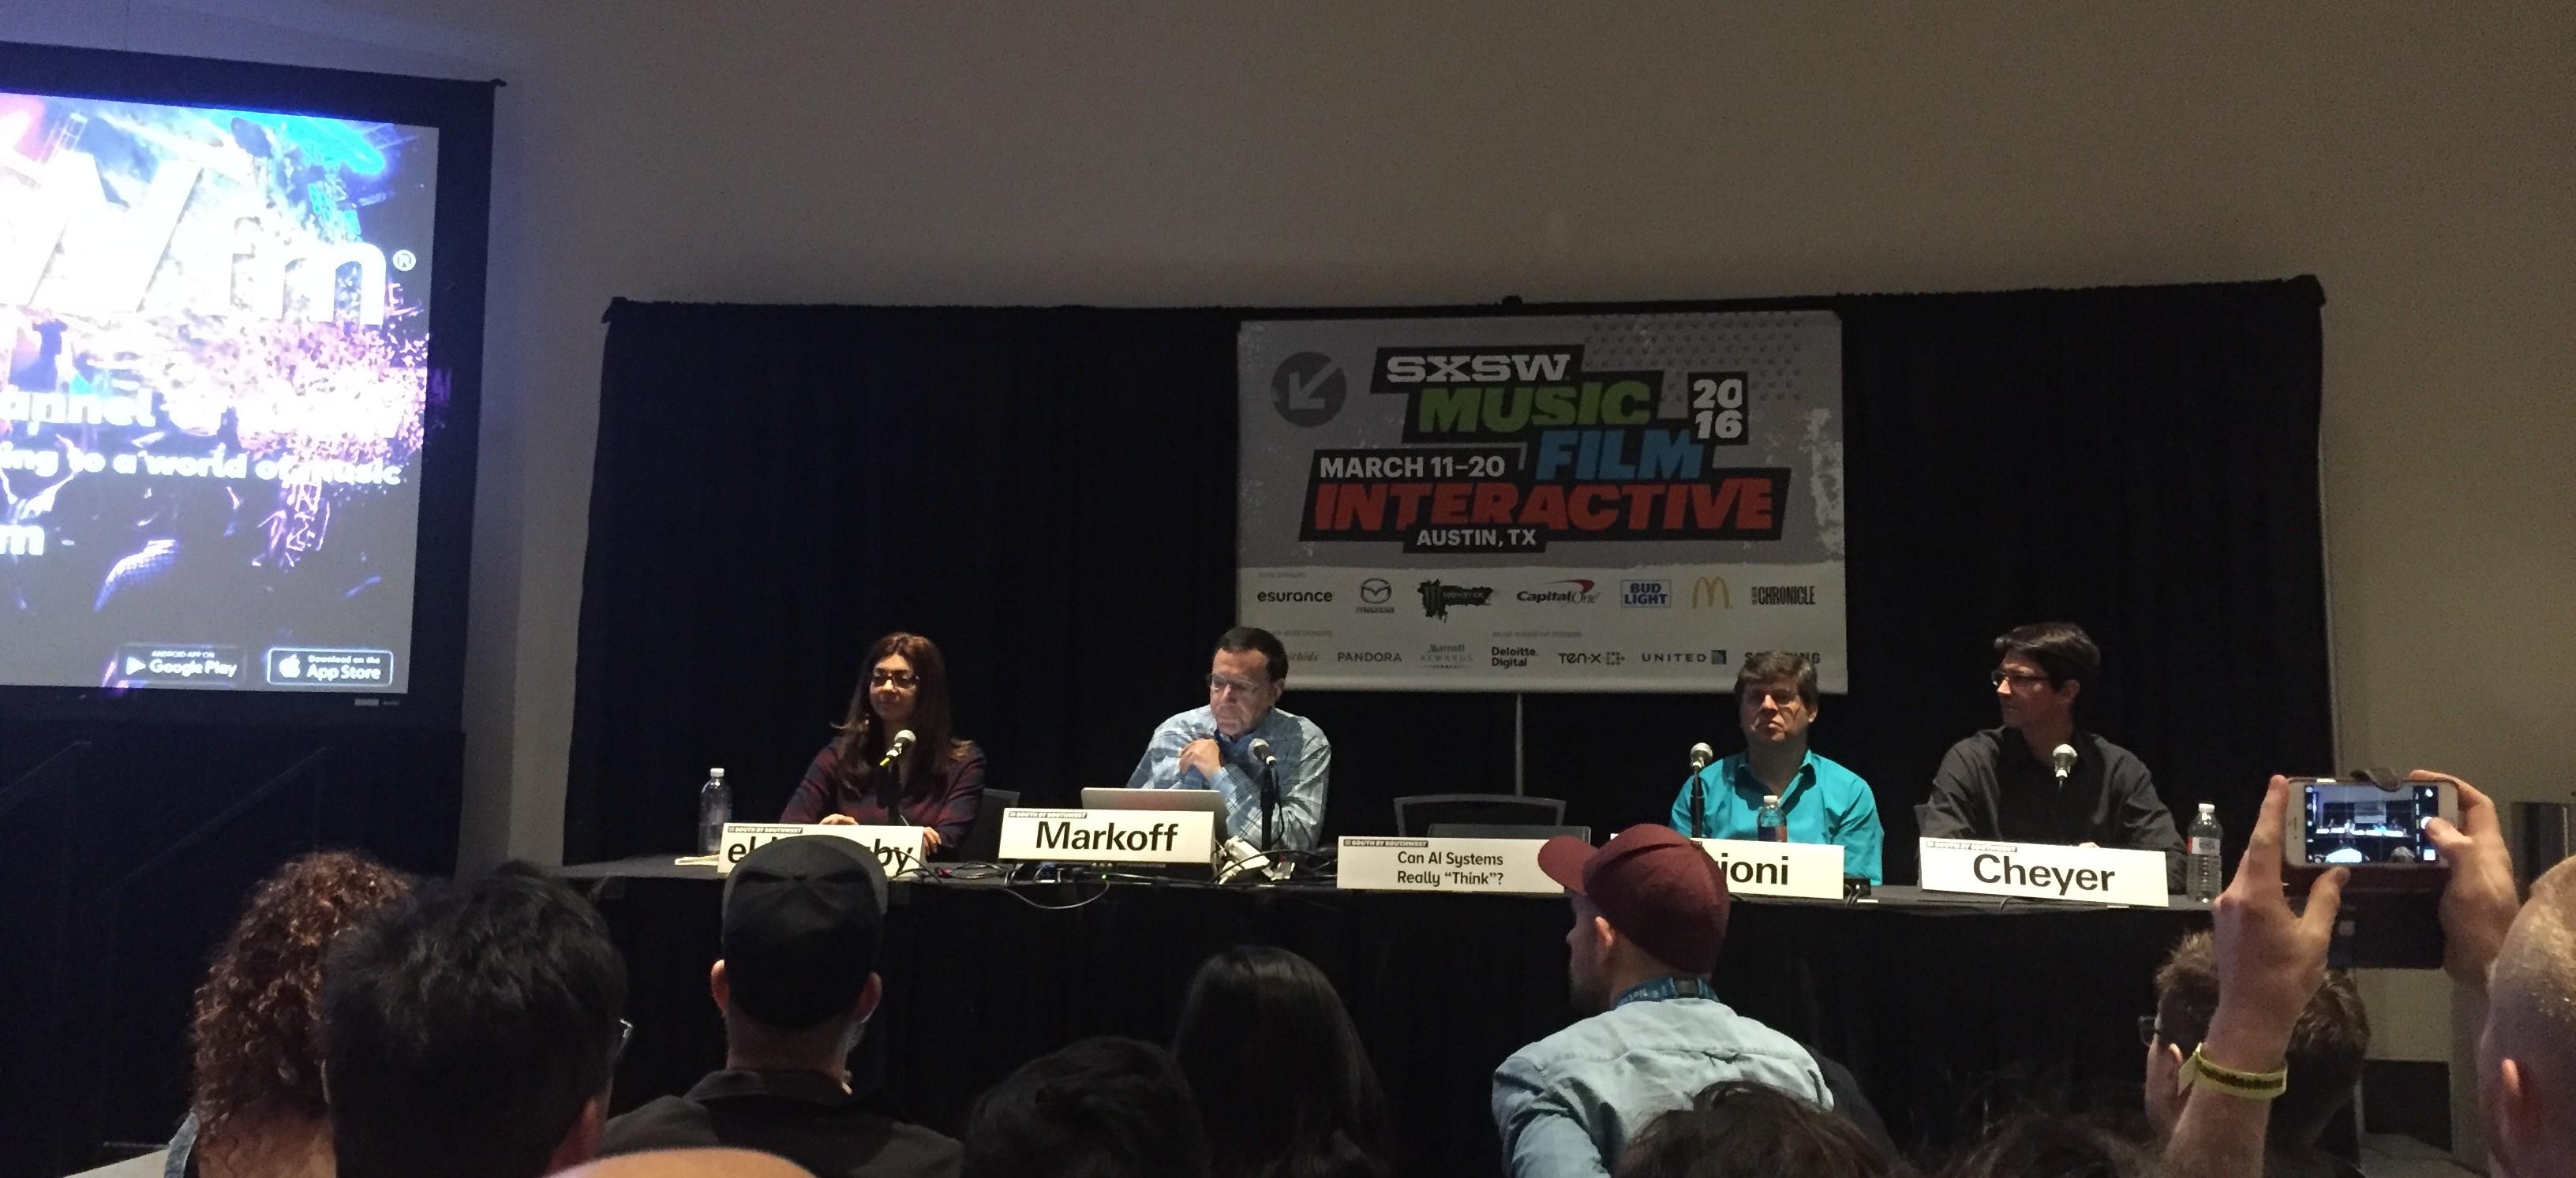 Kunnen AI systemen denken - Panel by SXSW 2016